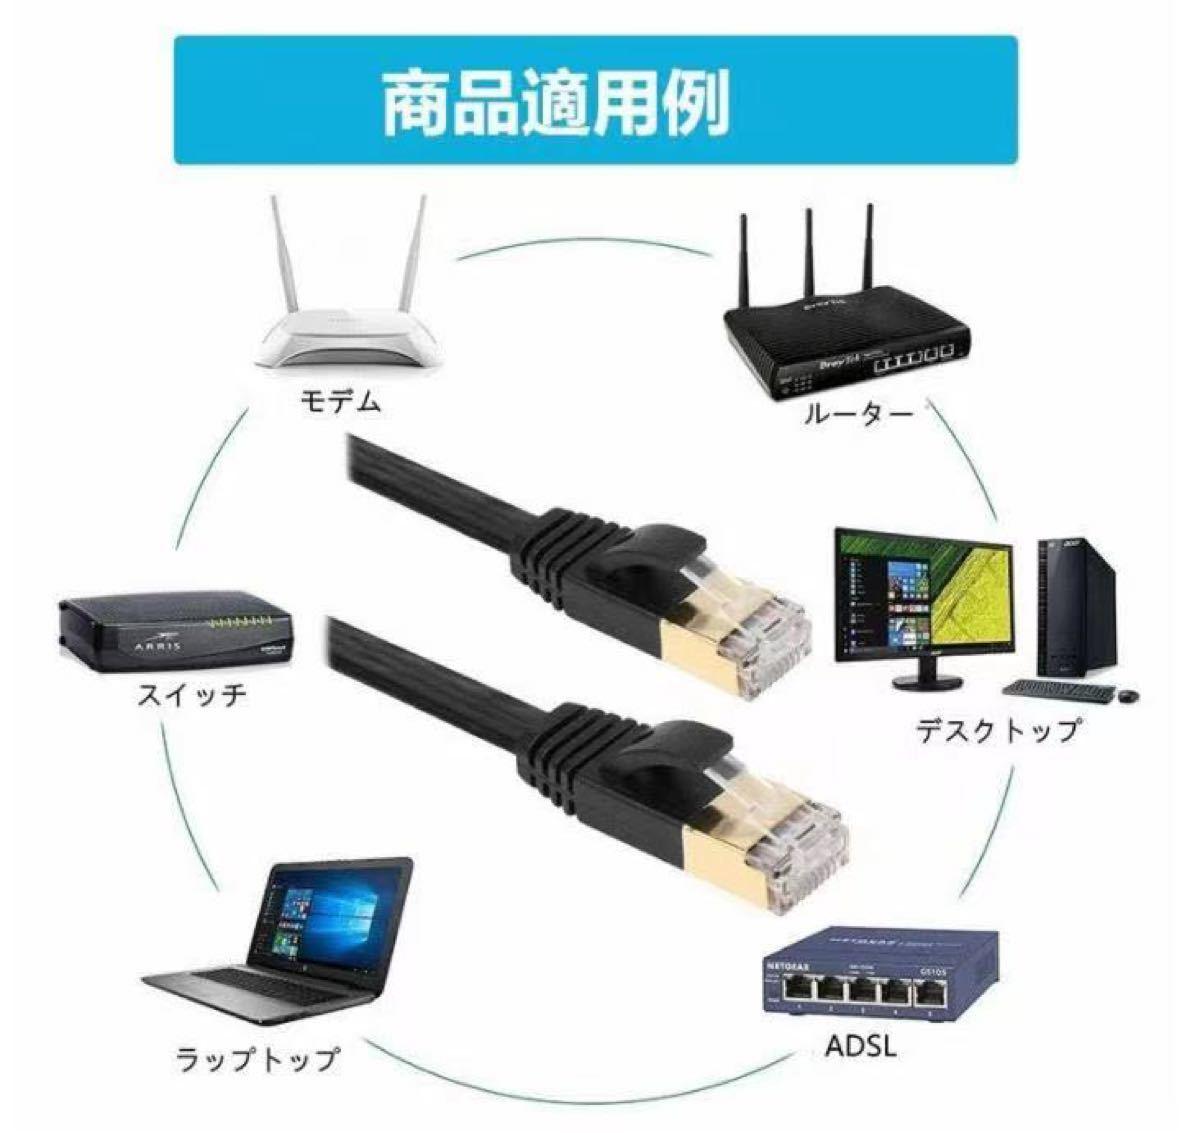 LANケーブル CAT8 3m RJ45 40ギガビット 高速光通信対応